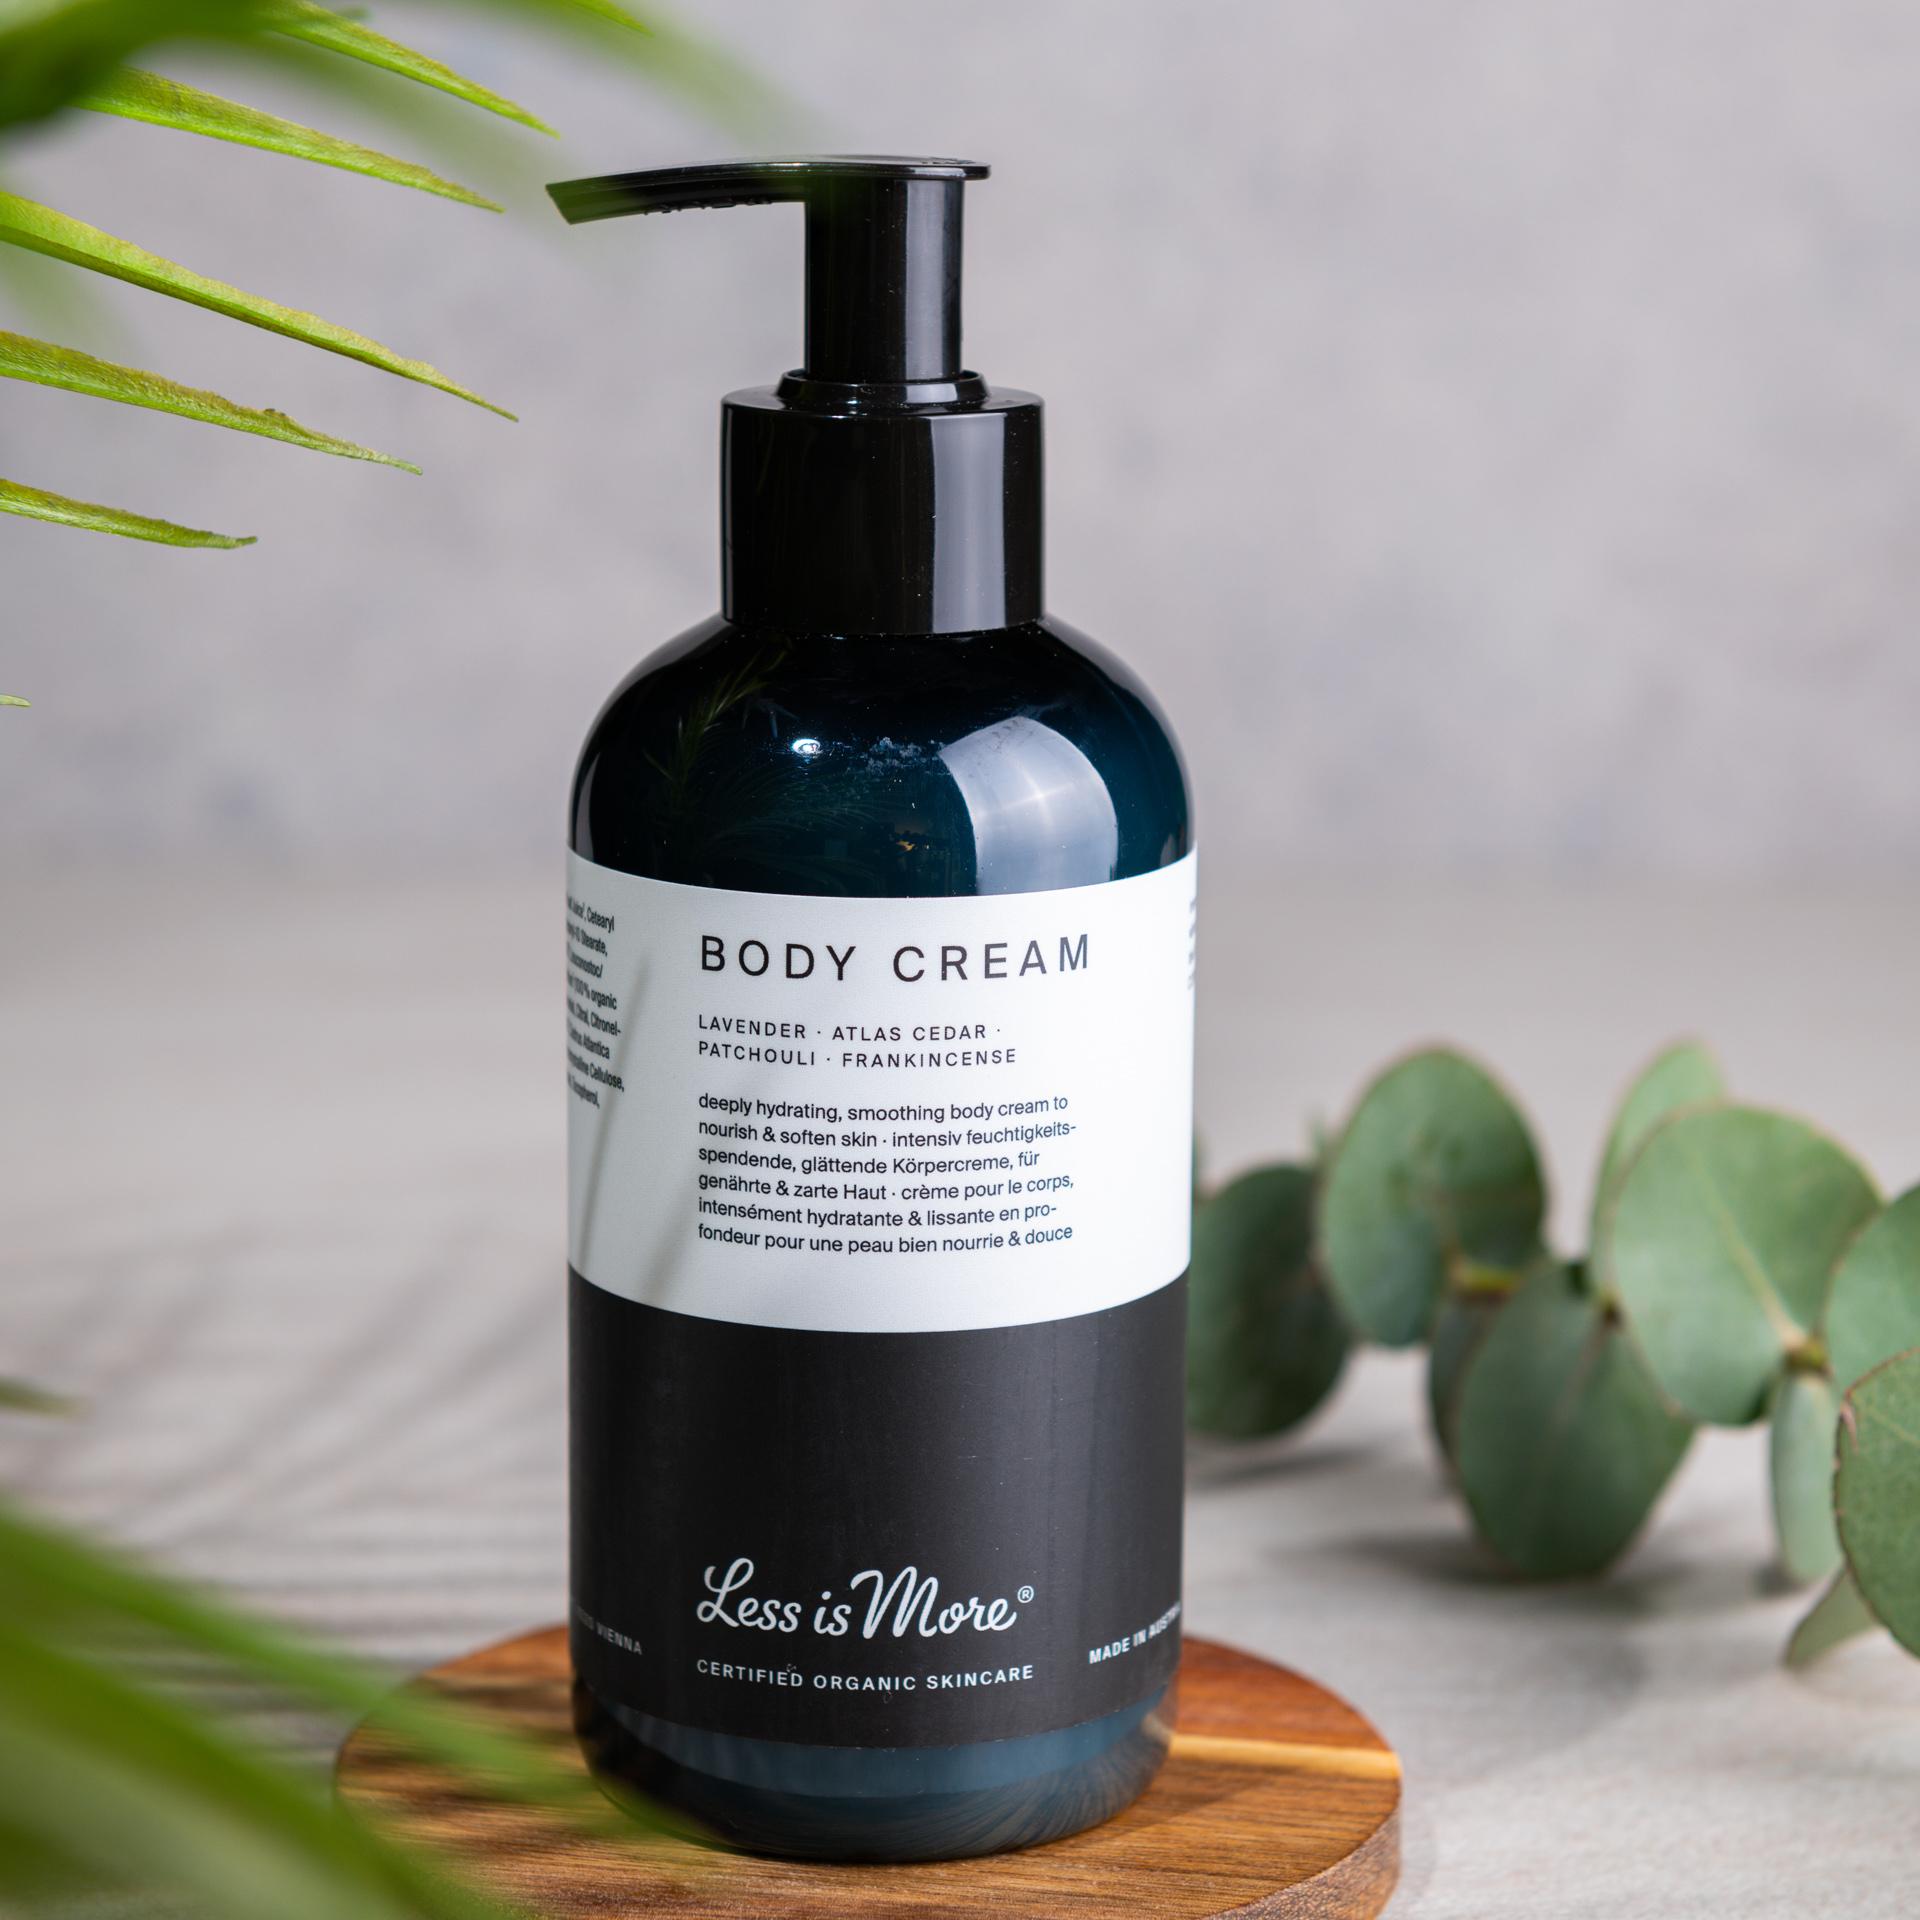 Body Cream Lavender · Atlas Cedar · Patchouli · Frankincense